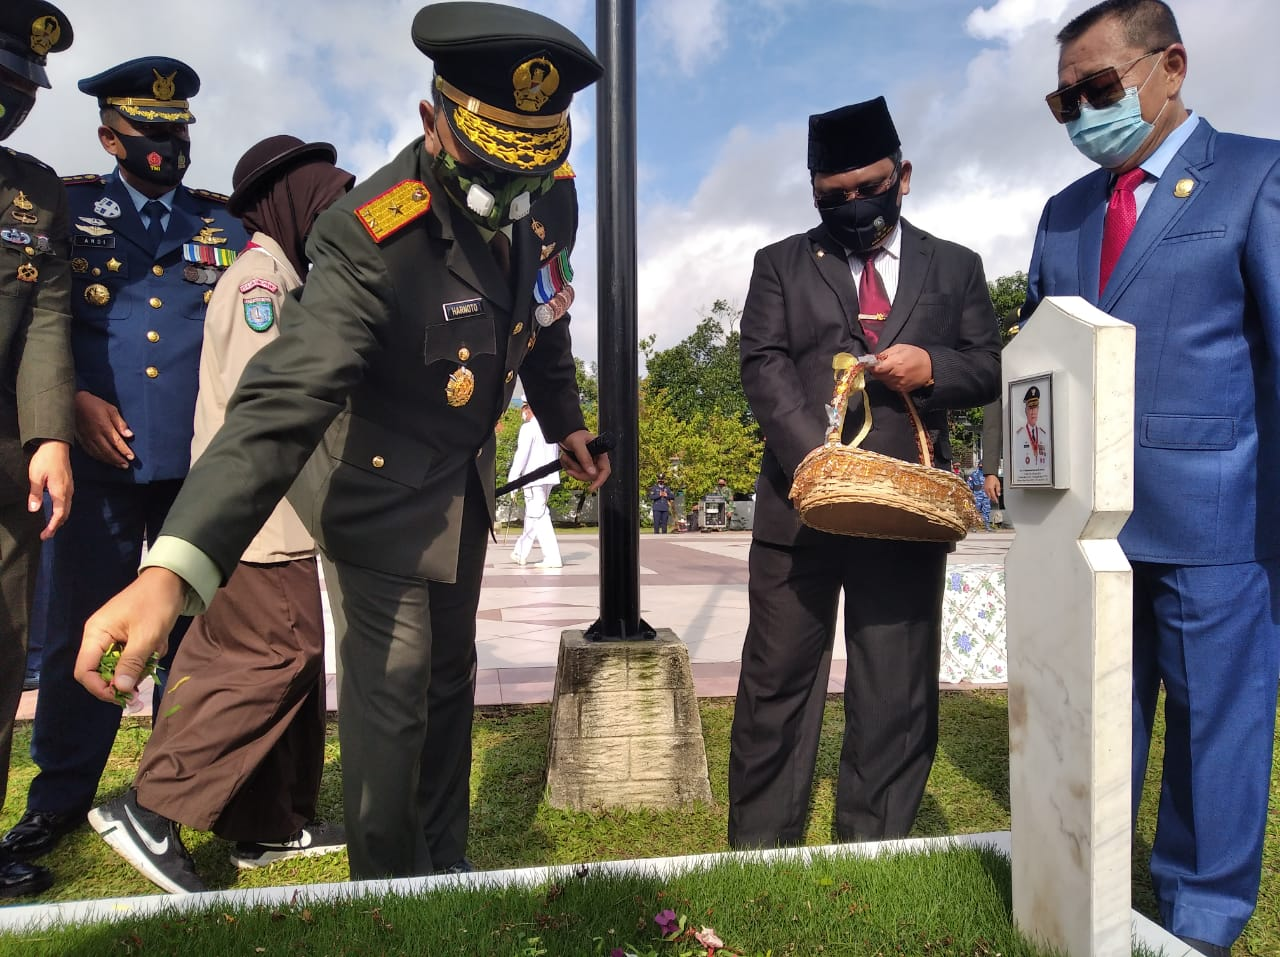 Danrem 033/WP Brigjen TNI Harnoto, S.Sos, Pimpin Ziarah rombongan peringatan Hari Ulang Tahun Tentara Nasional Indonesia (TNI) ke-75